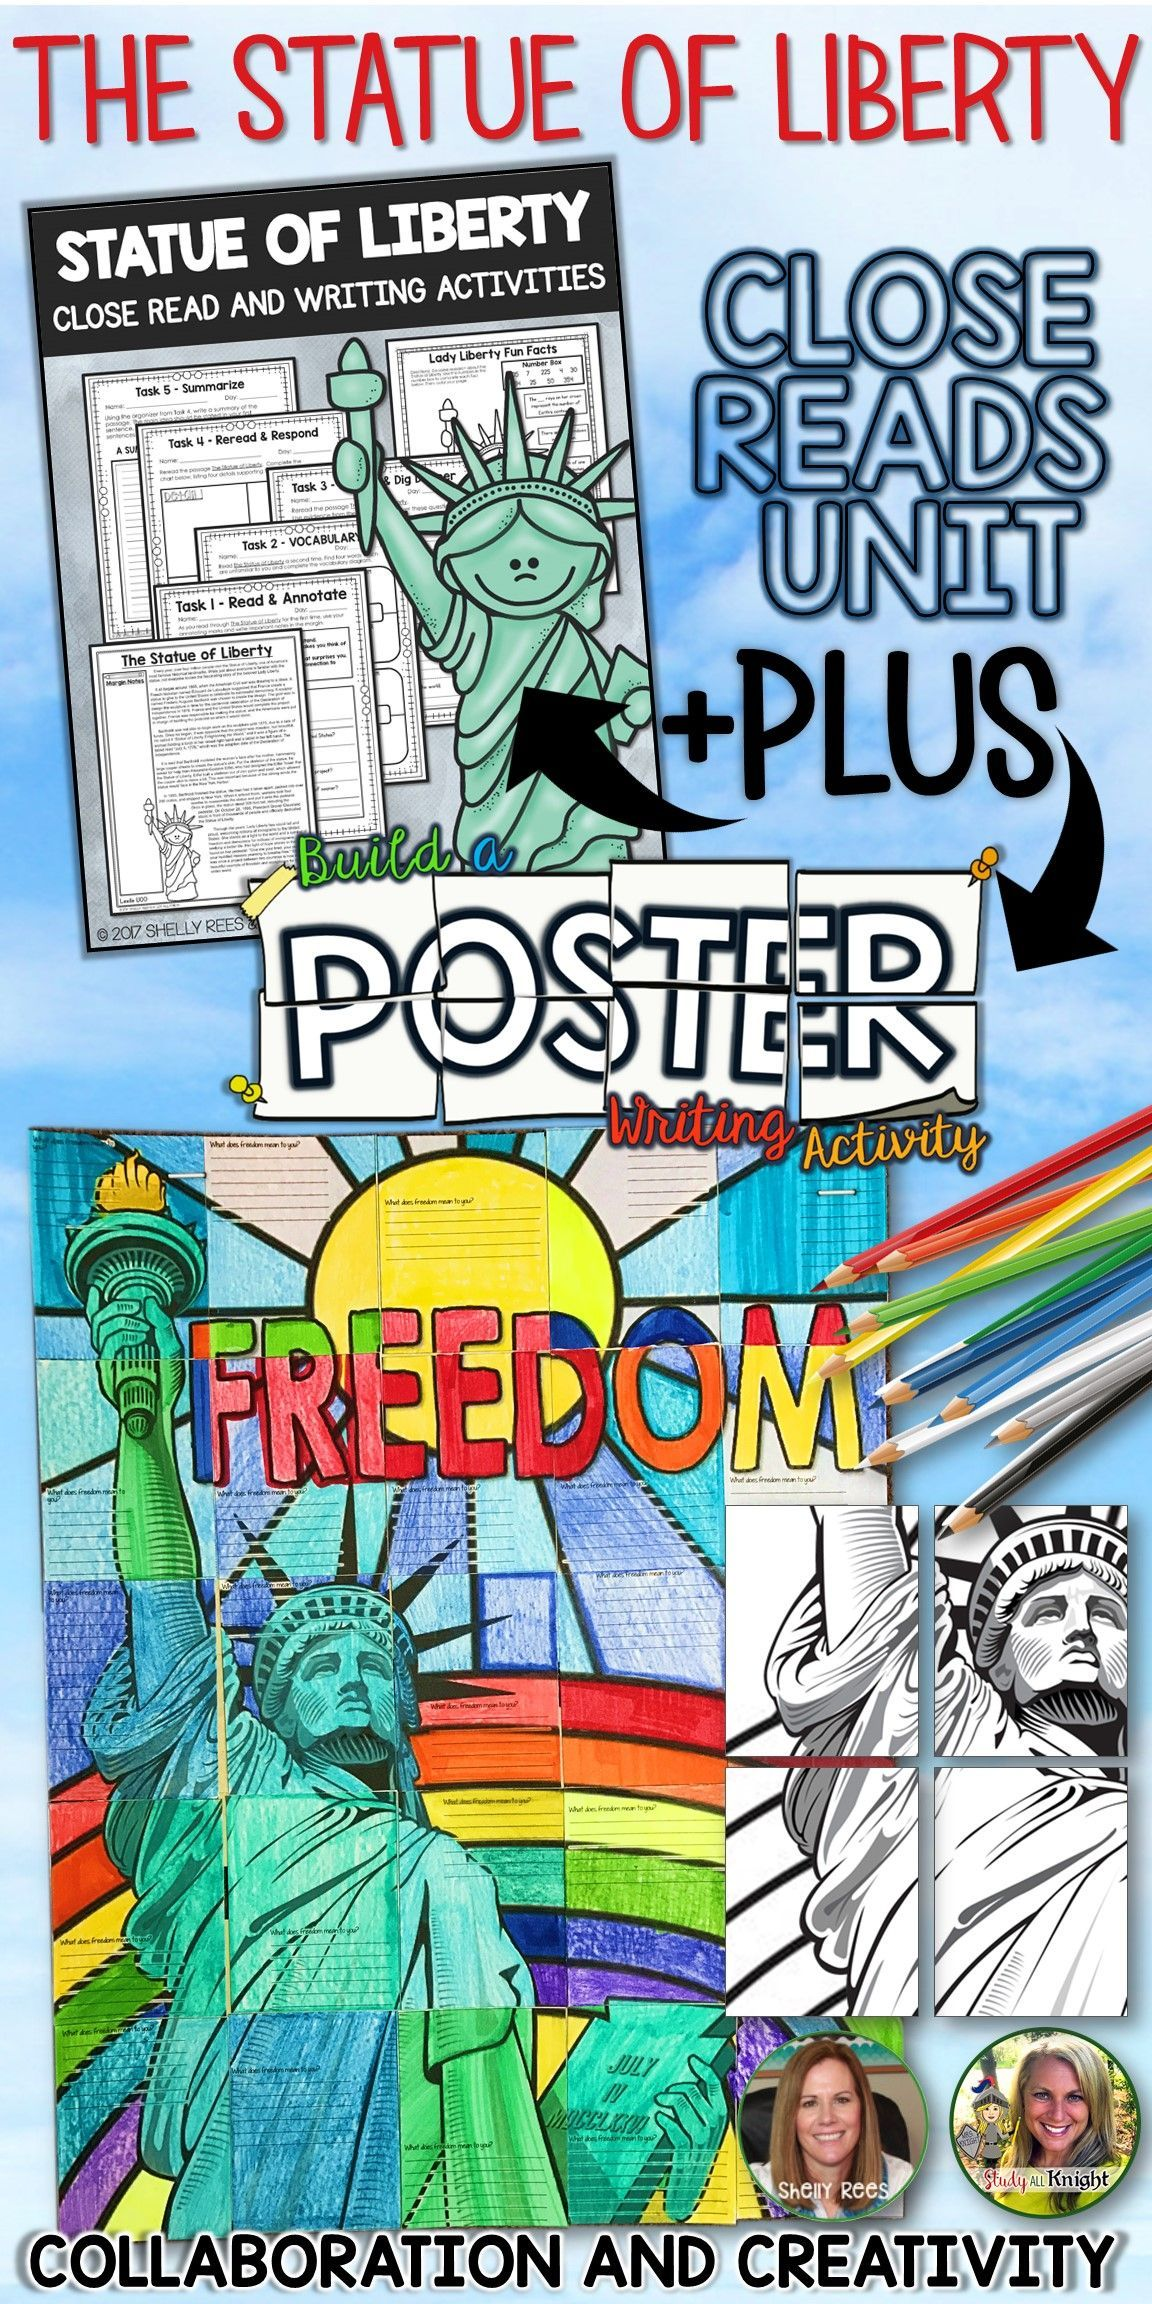 Statue Of Liberty Close Reads Unit Collaborative Poster